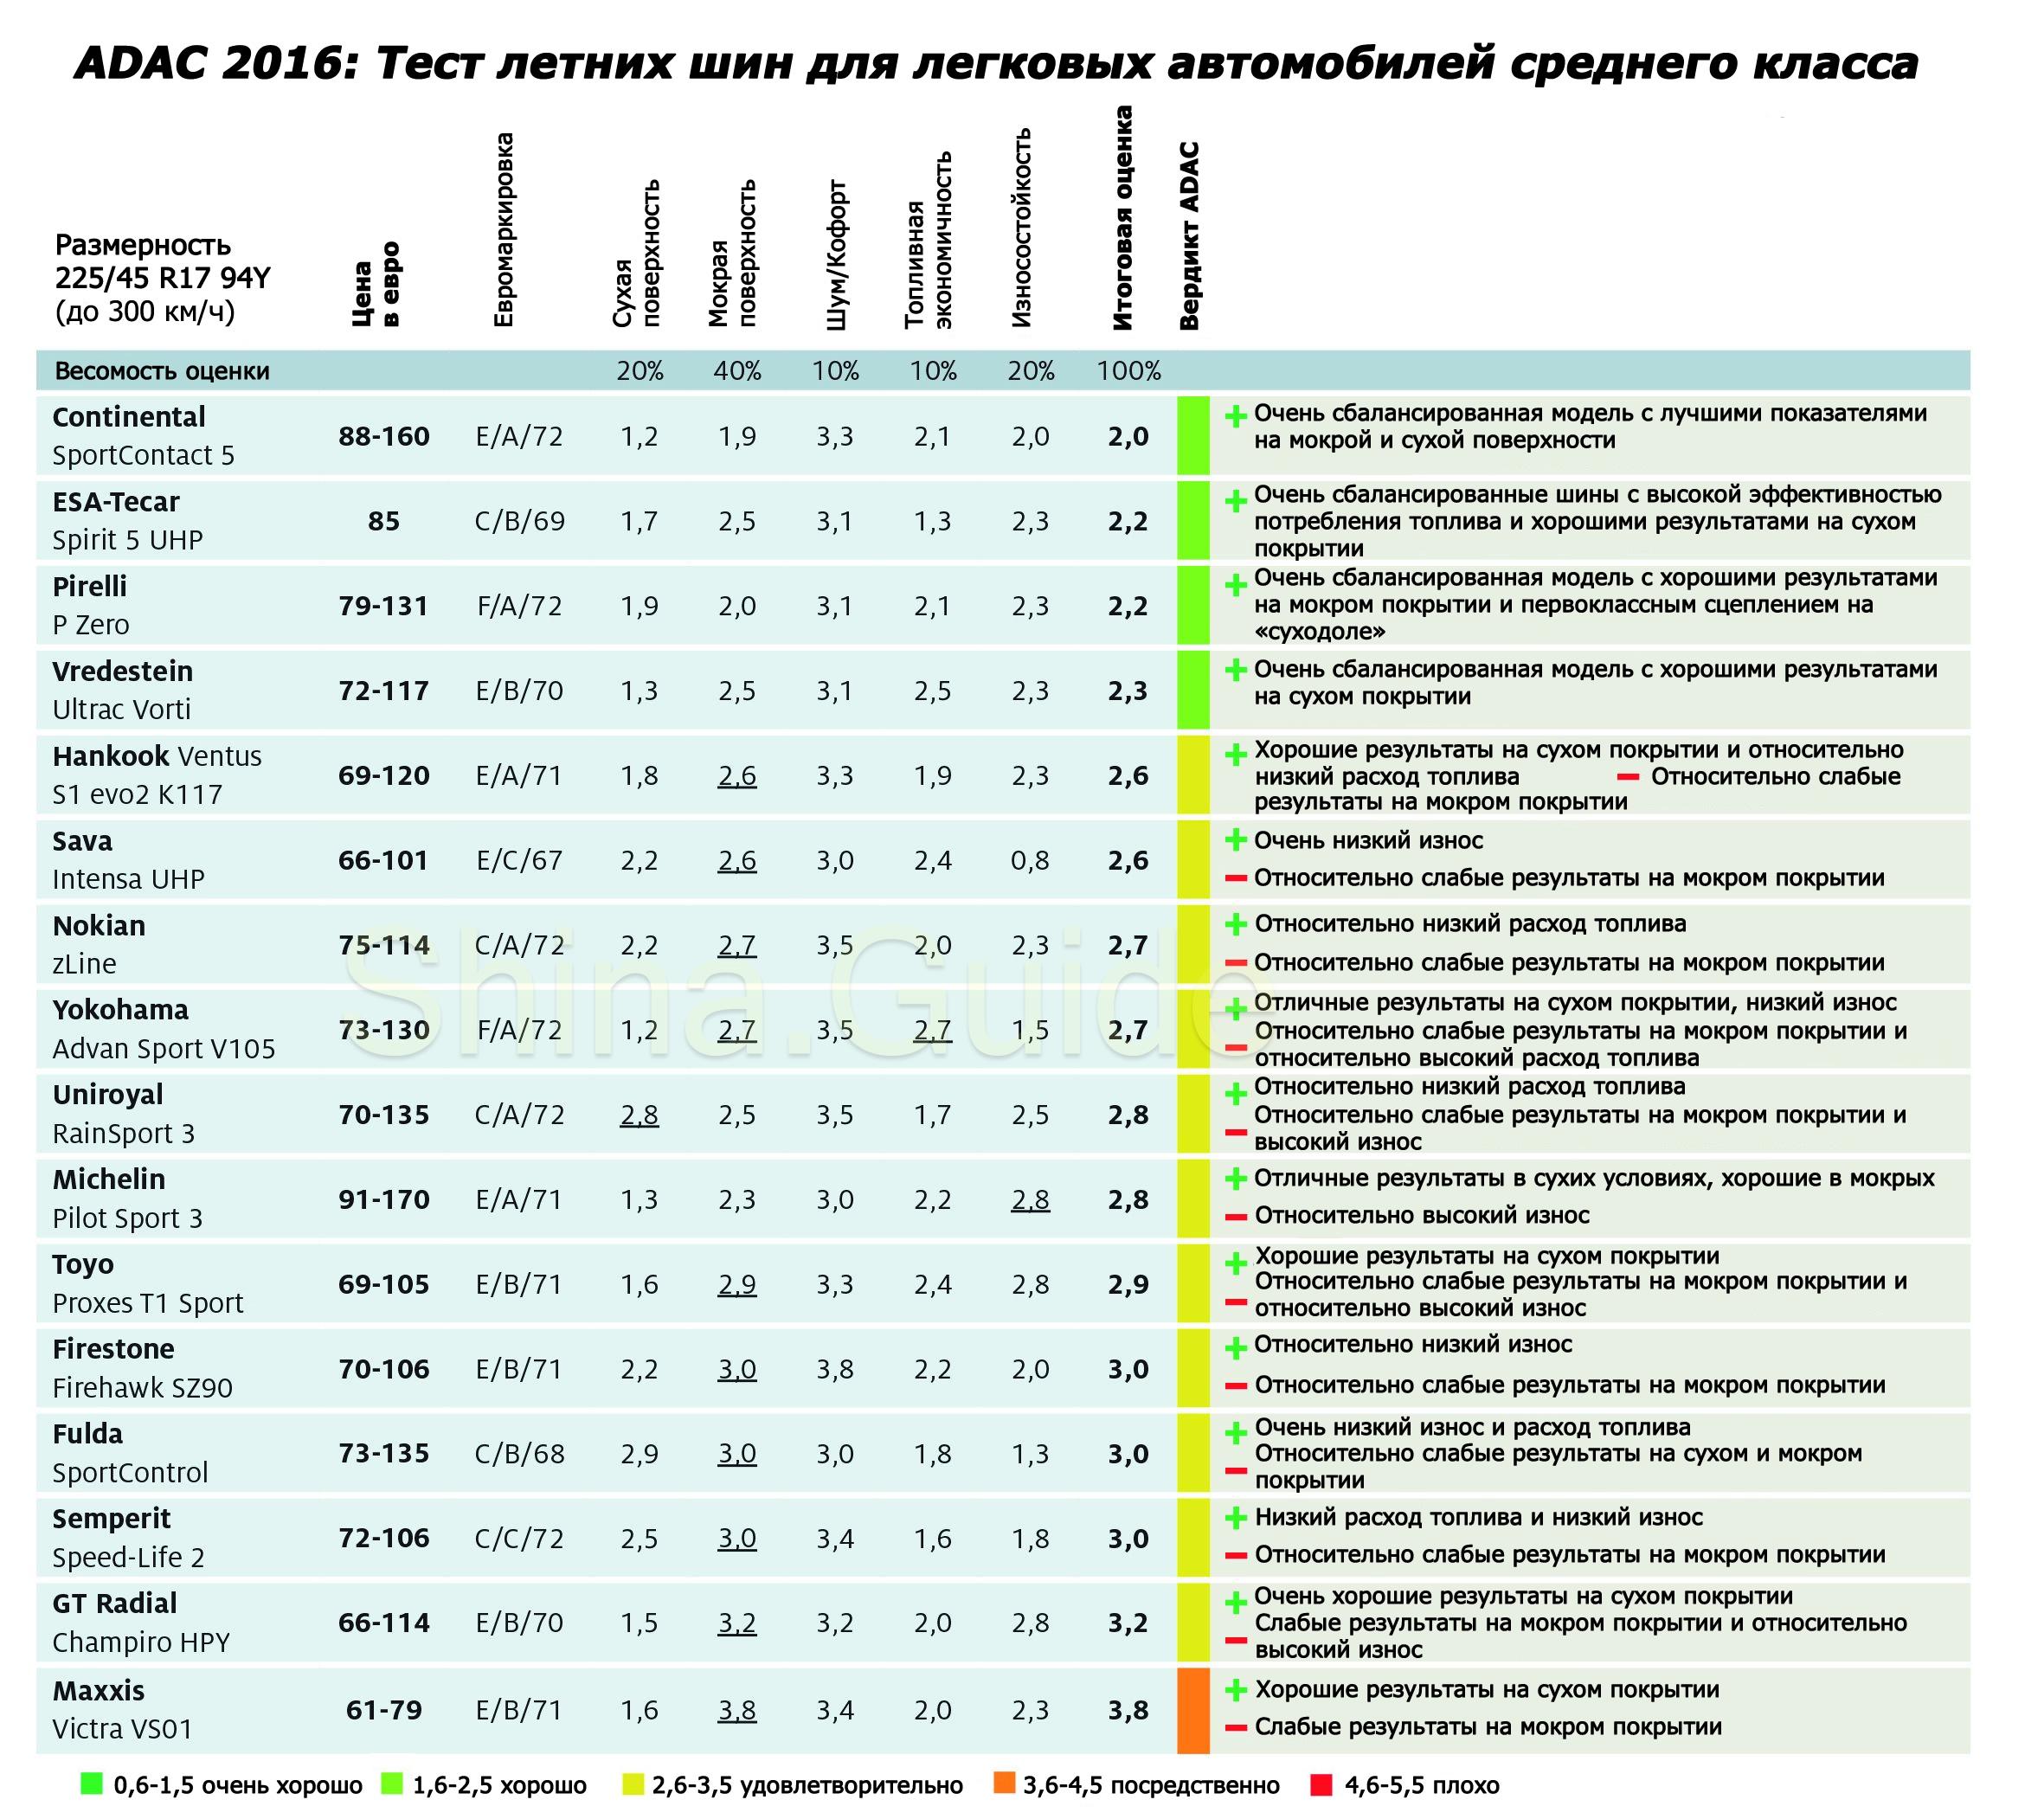 adac-2016-summer-tire-test-results-225-45-r17